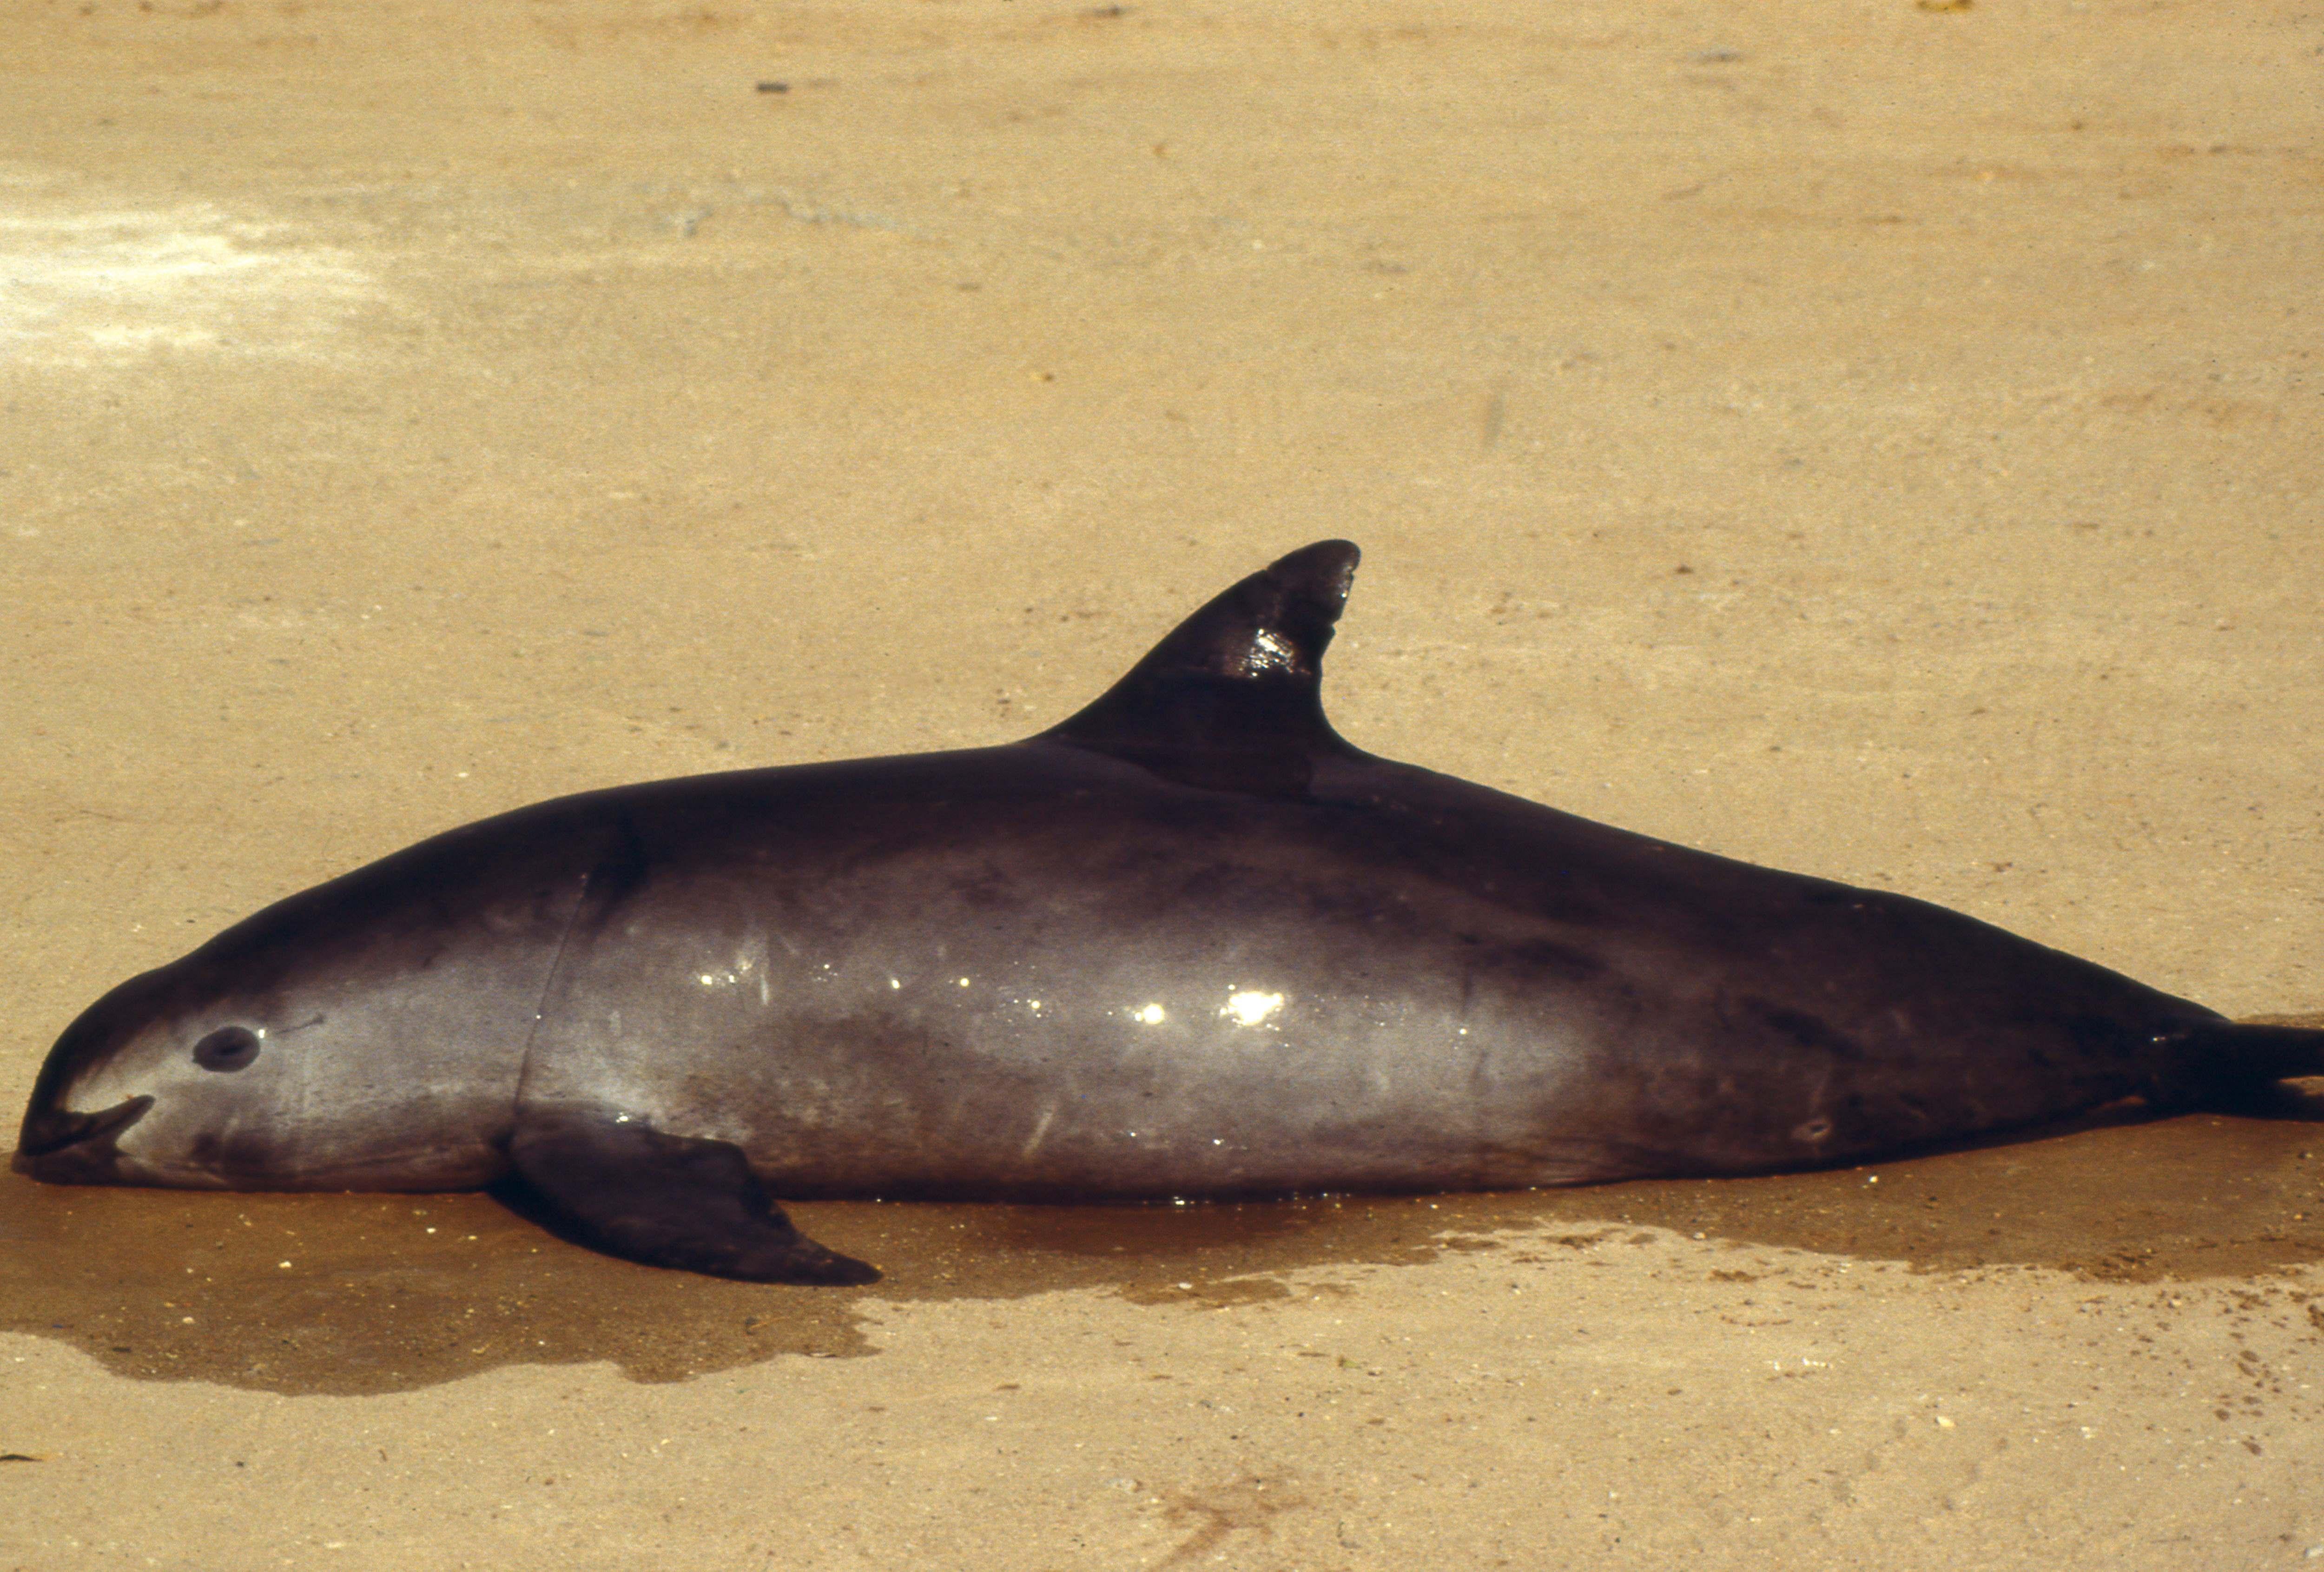 El hábitat de la vaquita marina declarado Patrimonio Mundial en peligro